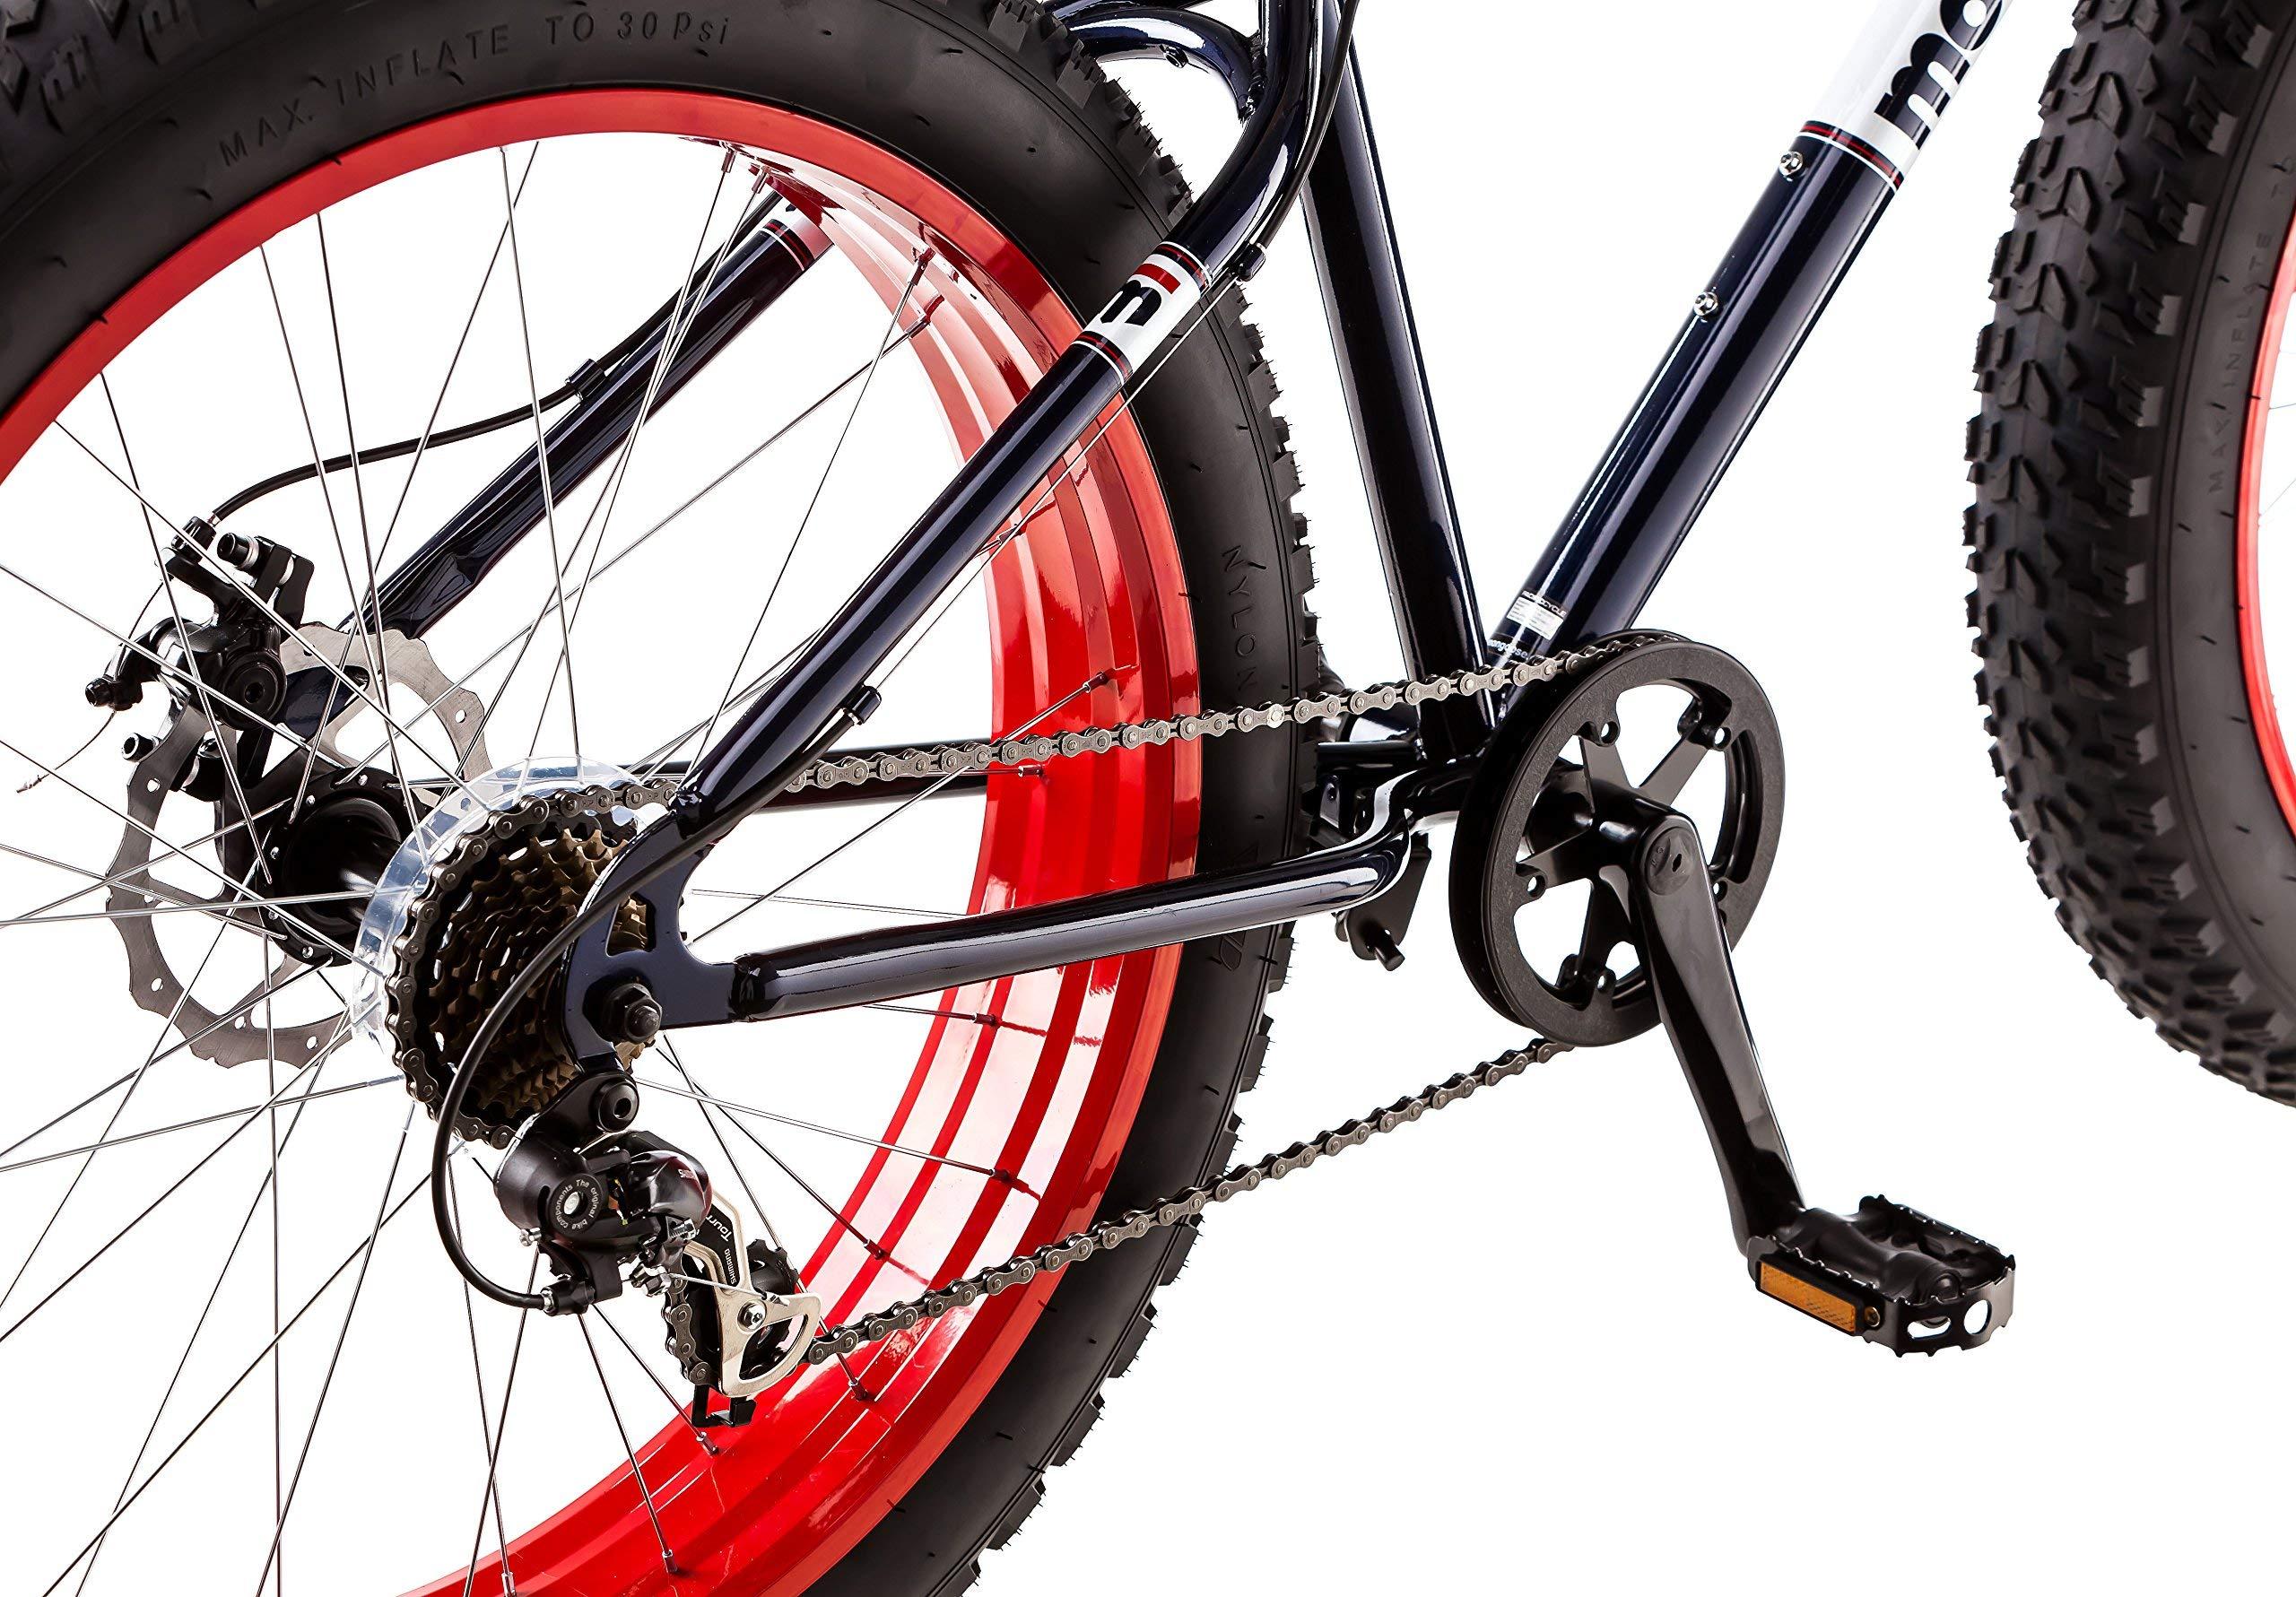 offizieller Preis elegante Form schöne Schuhe Mongoose Dolomite Fat Tire Bike 26 wheel size 18